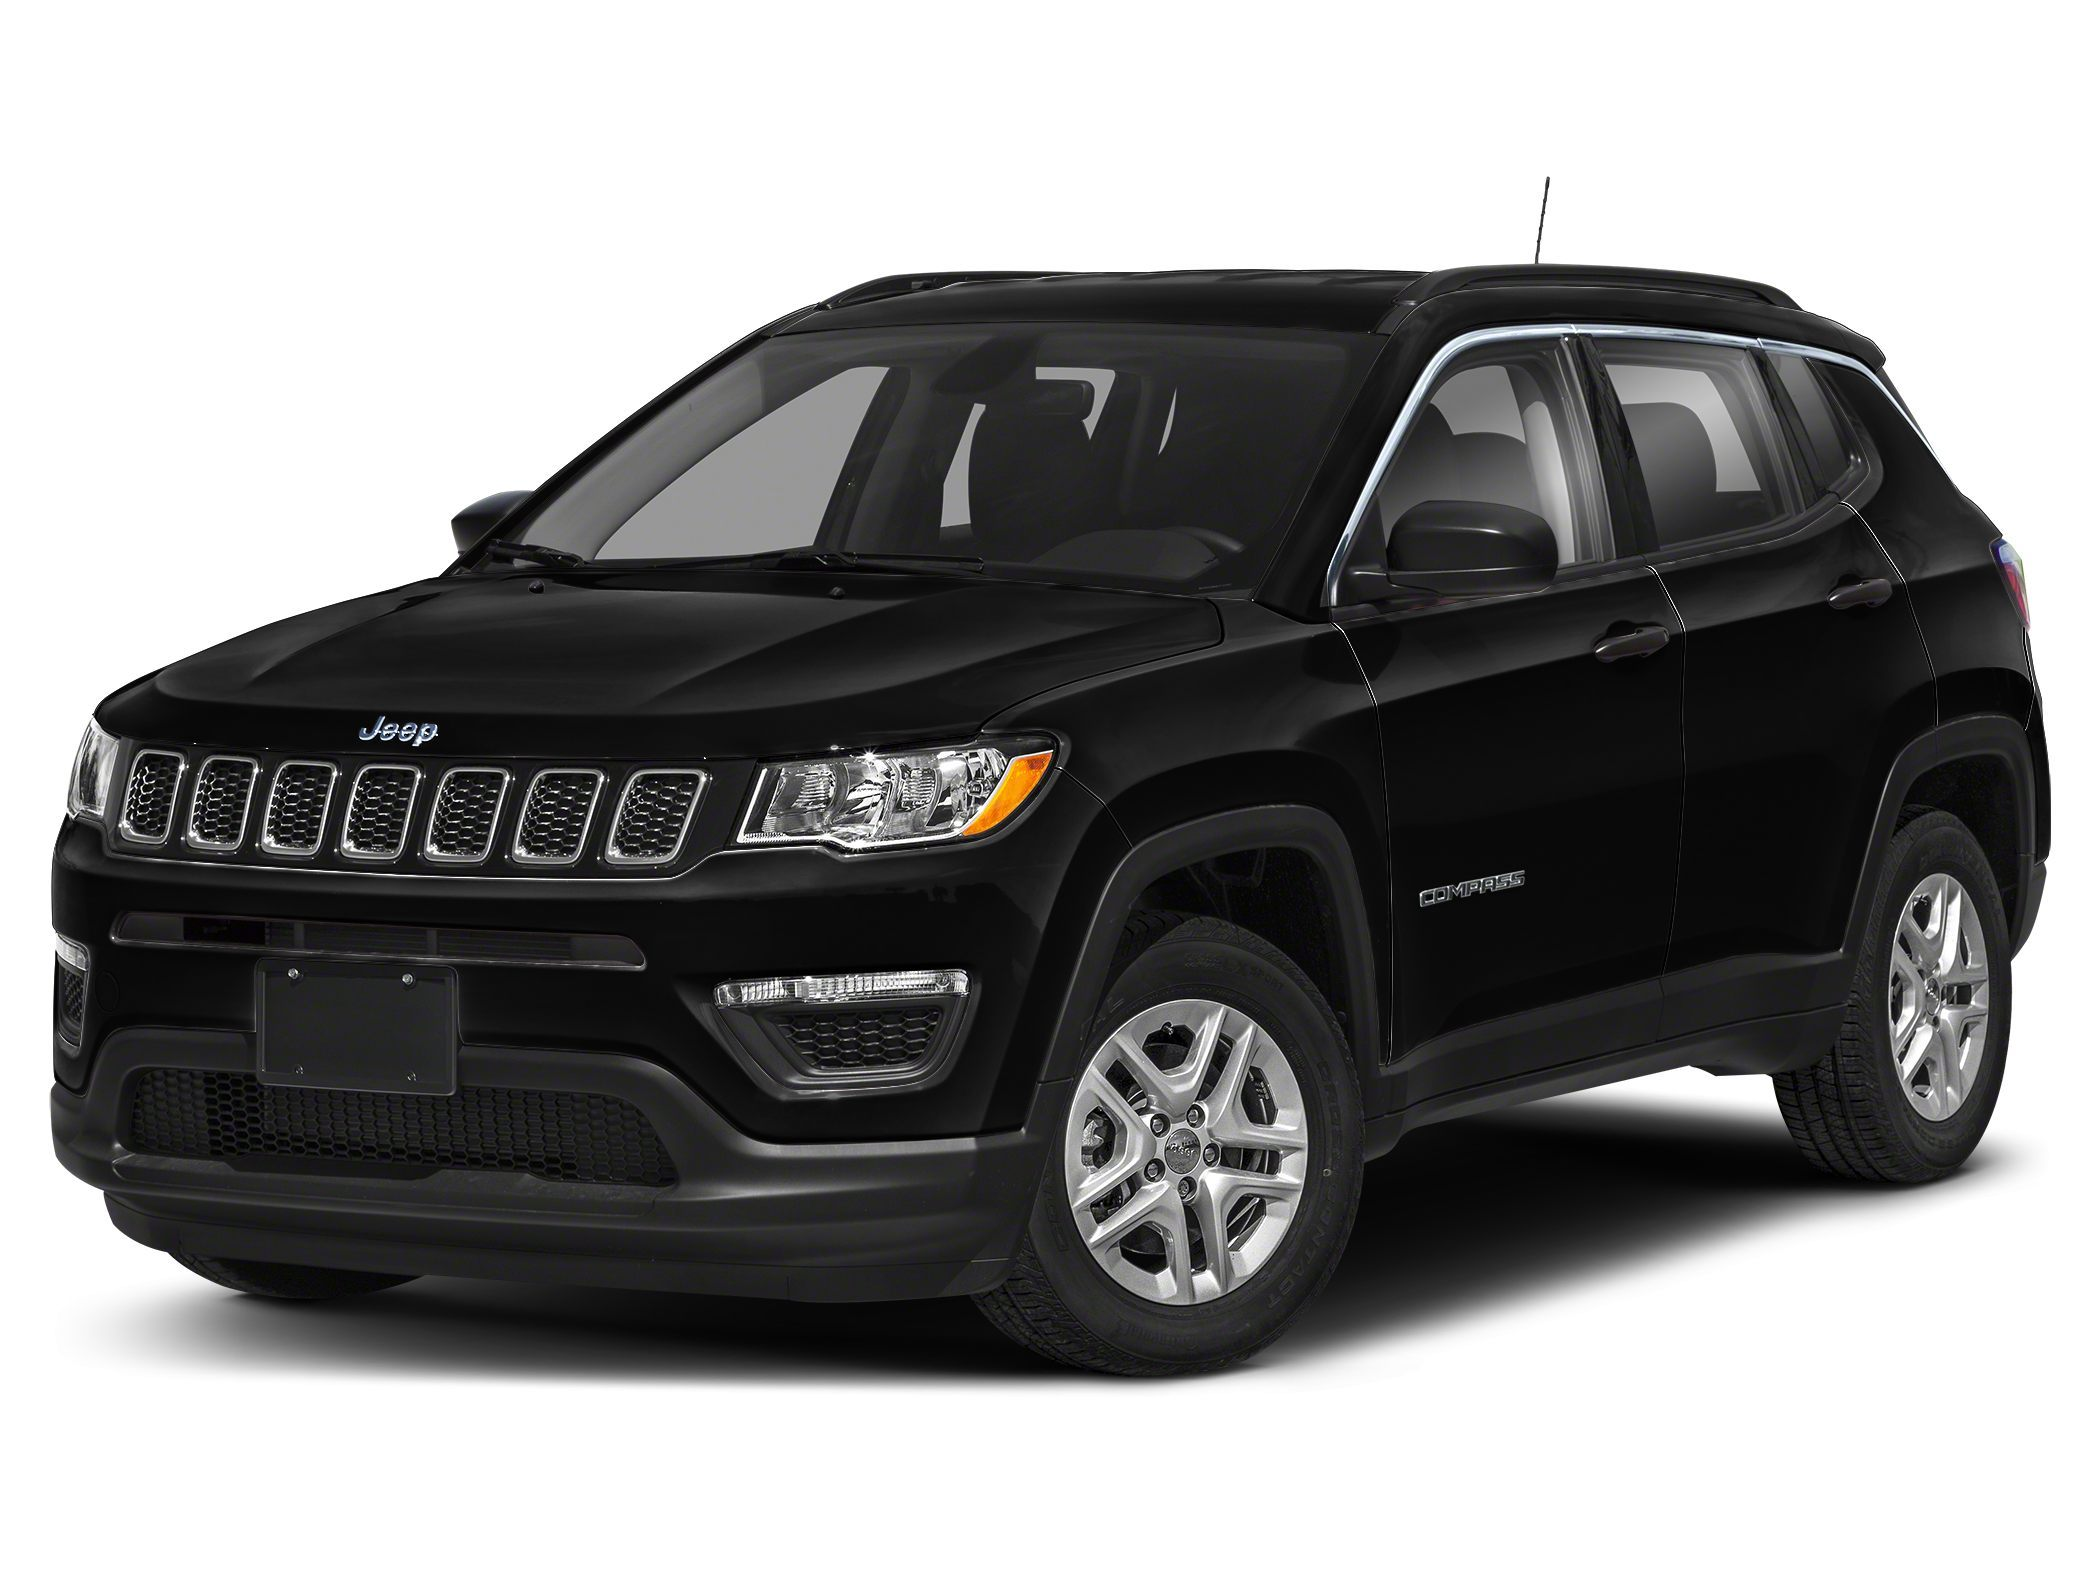 2021 Jeep Compass 4x4